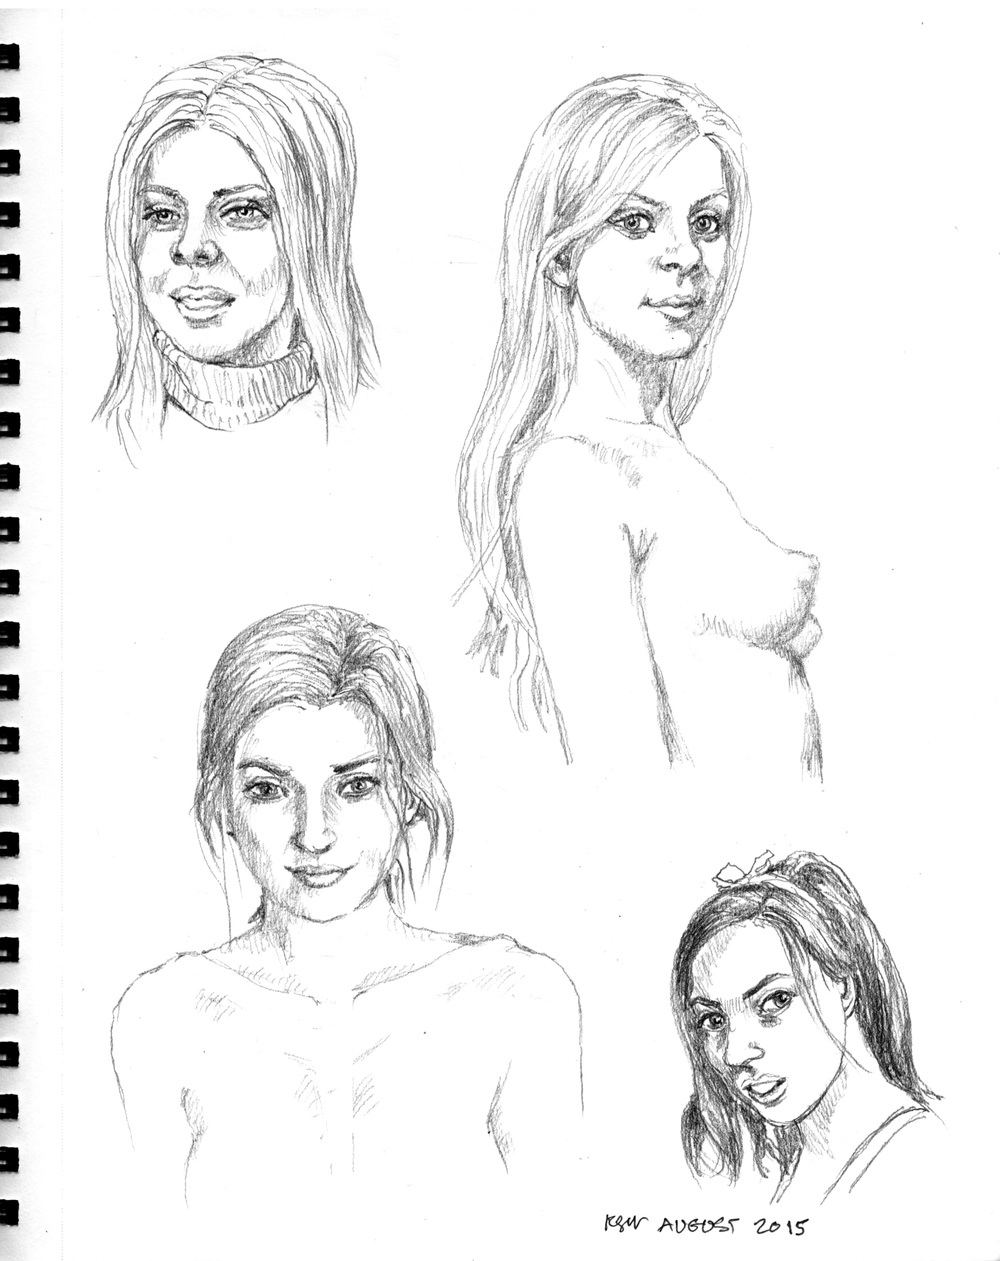 August sept 2015 sketches_281.jpg